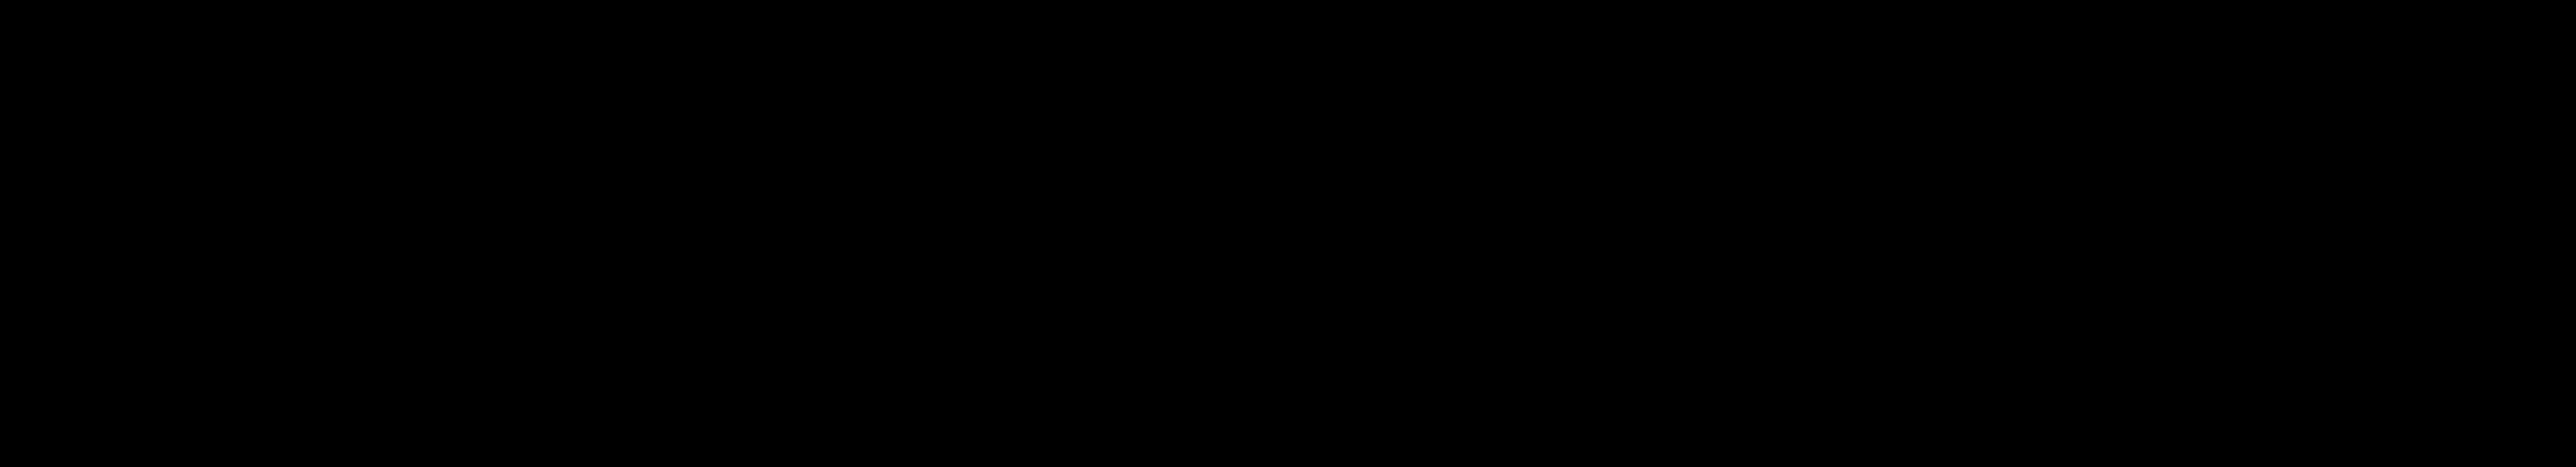 Spacemaker logo